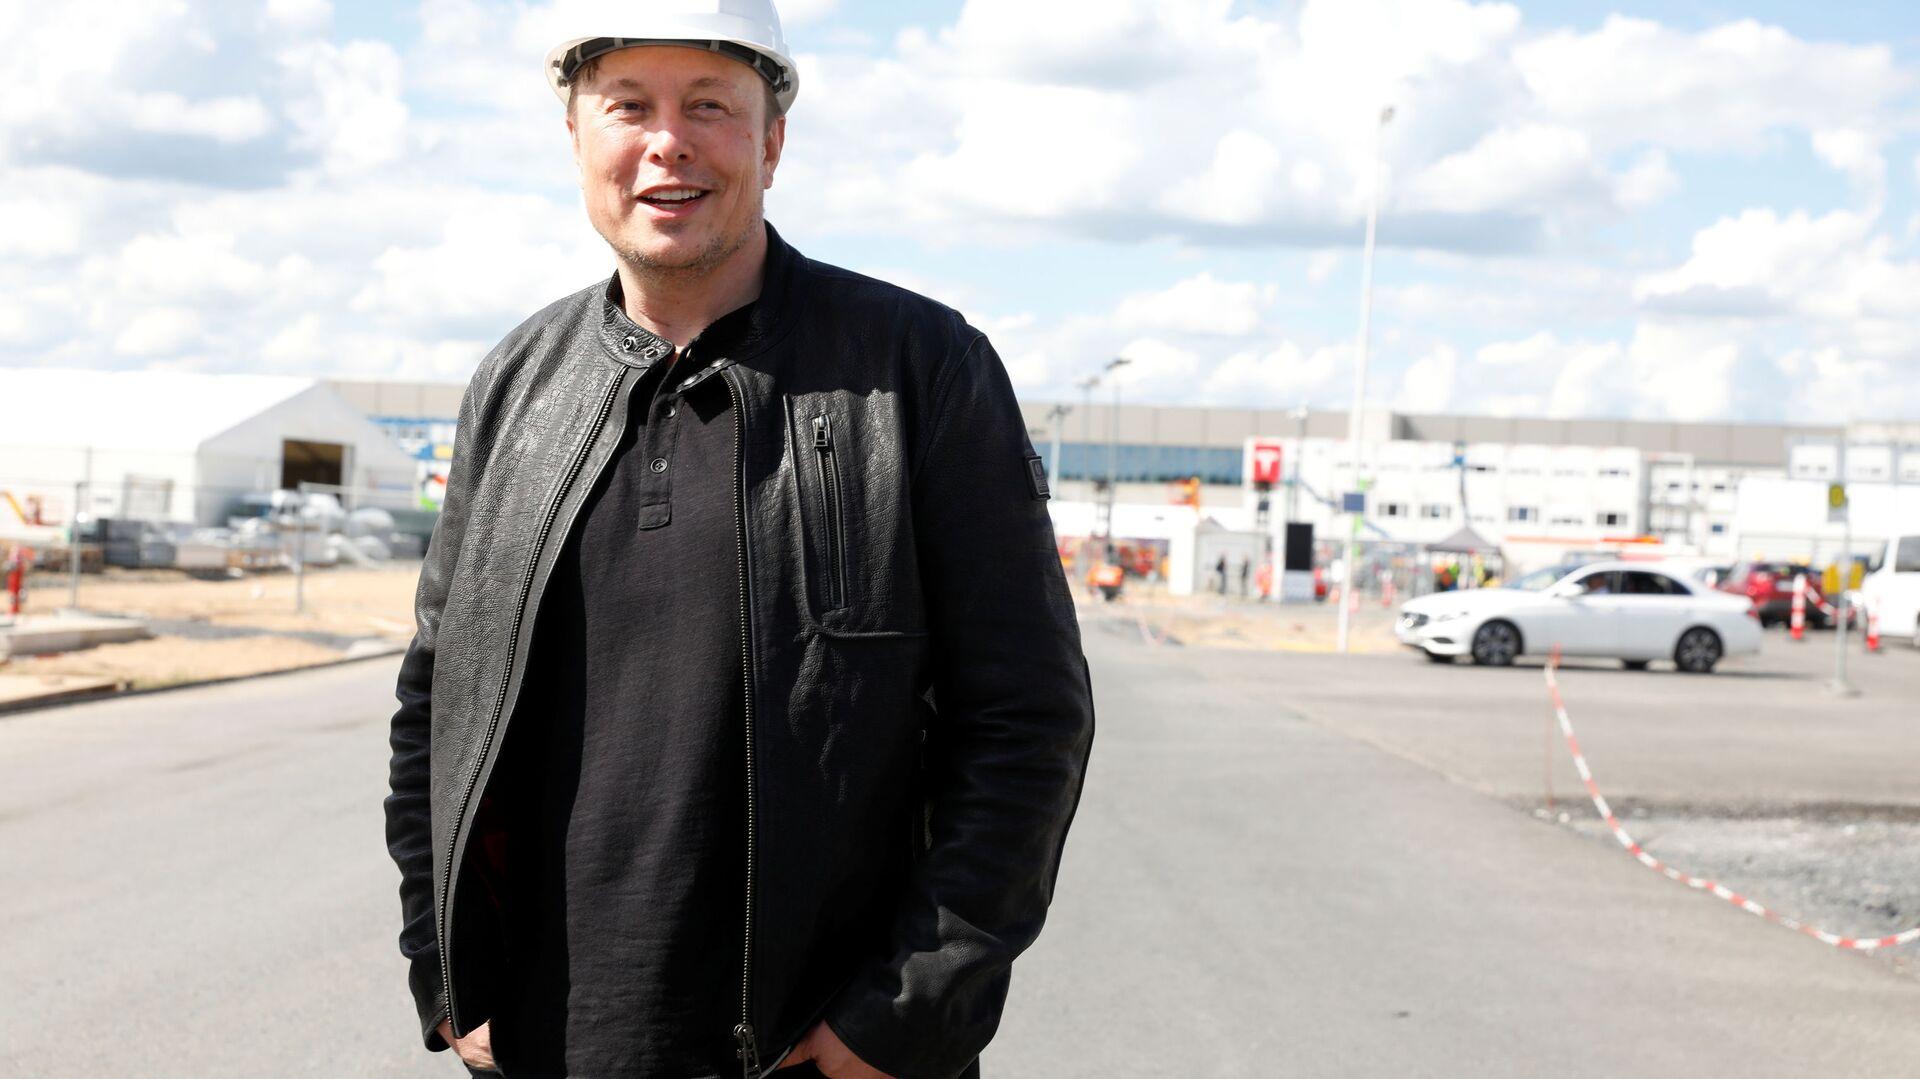 Il CEO di Tesla Elon Musk alla fabbrica Tesla Gigafactory 4, in Germania - Sputnik Italia, 1920, 13.08.2021